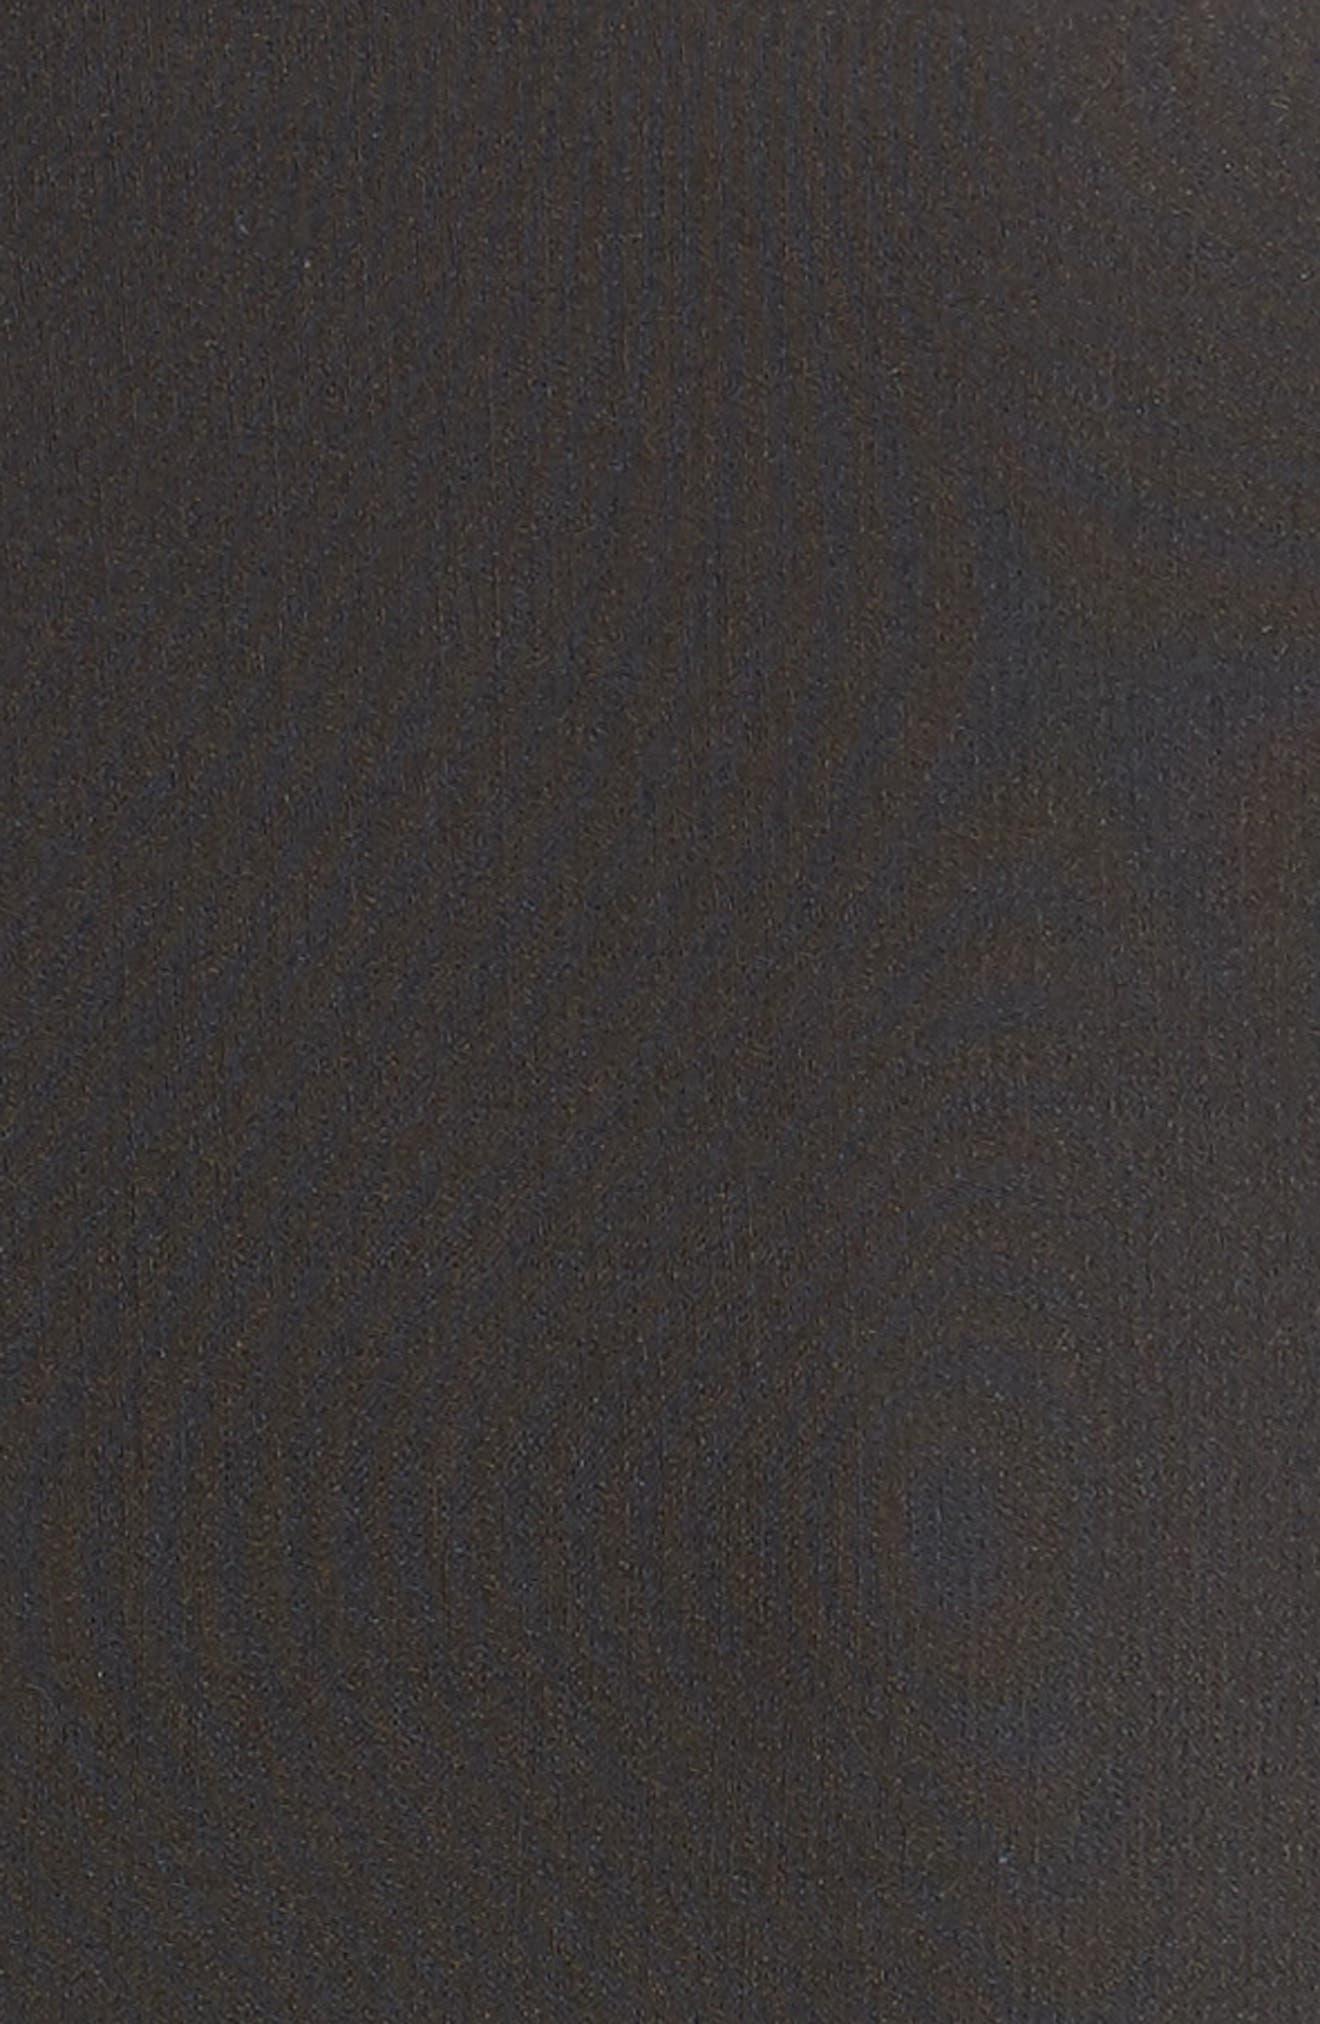 Stretch Pebble Crepe Bolero Sheath Dress,                             Alternate thumbnail 6, color,